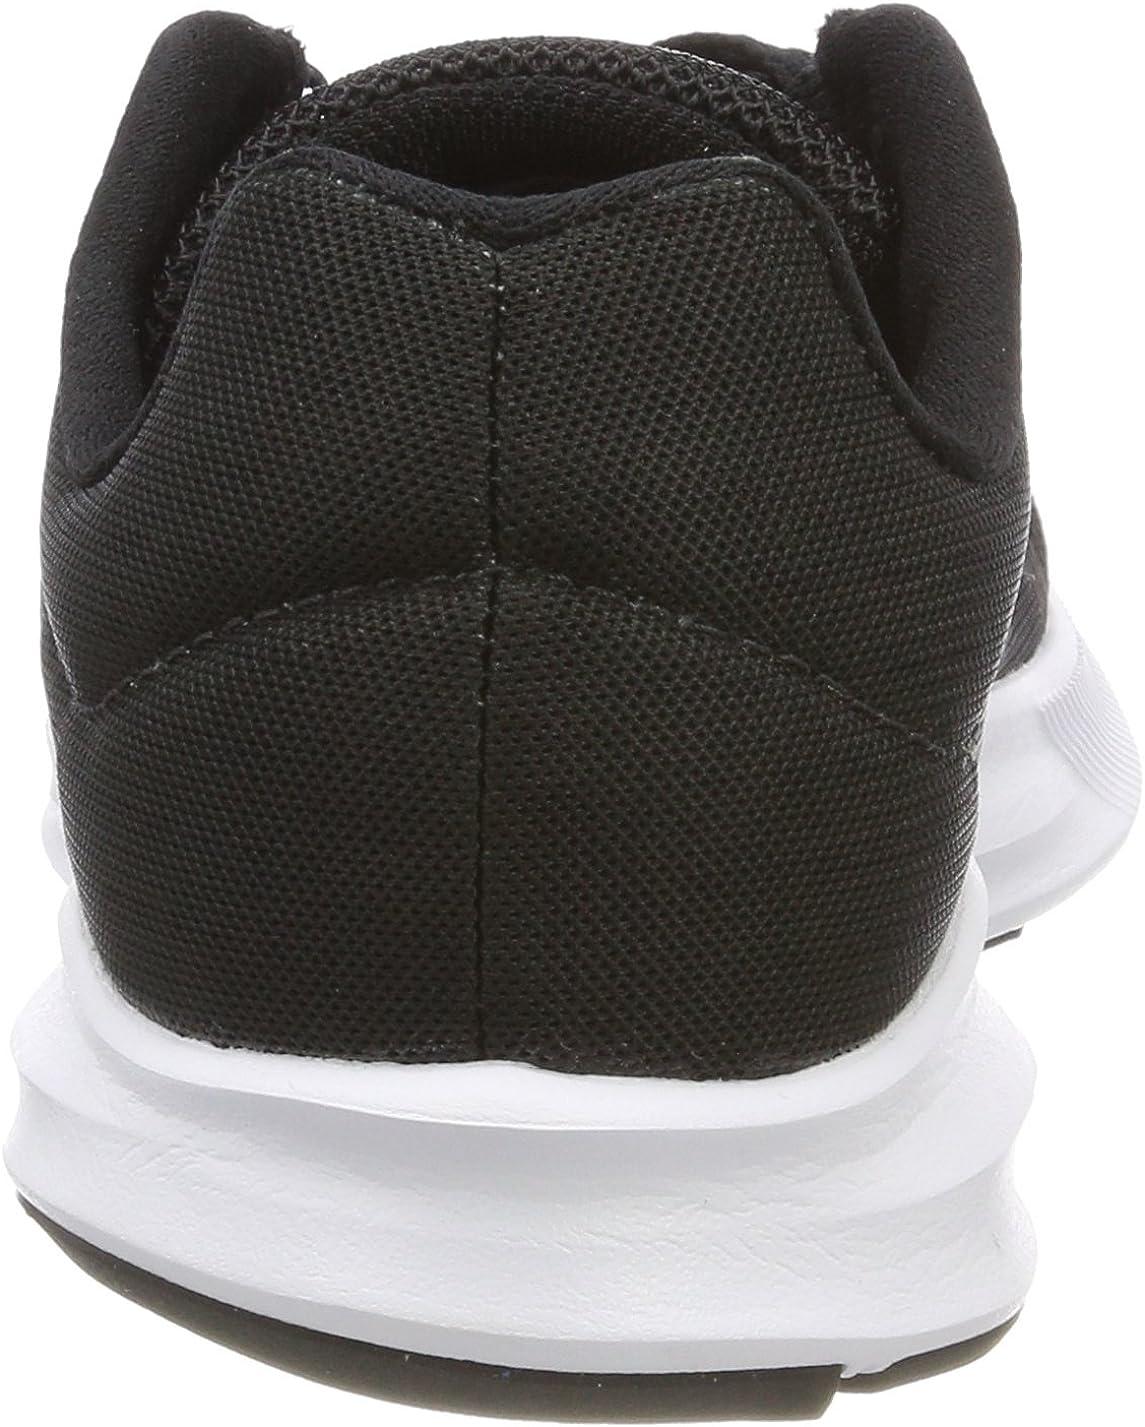 Nike Women's Downshifter 8 Running Shoe Black/White/Anthracite